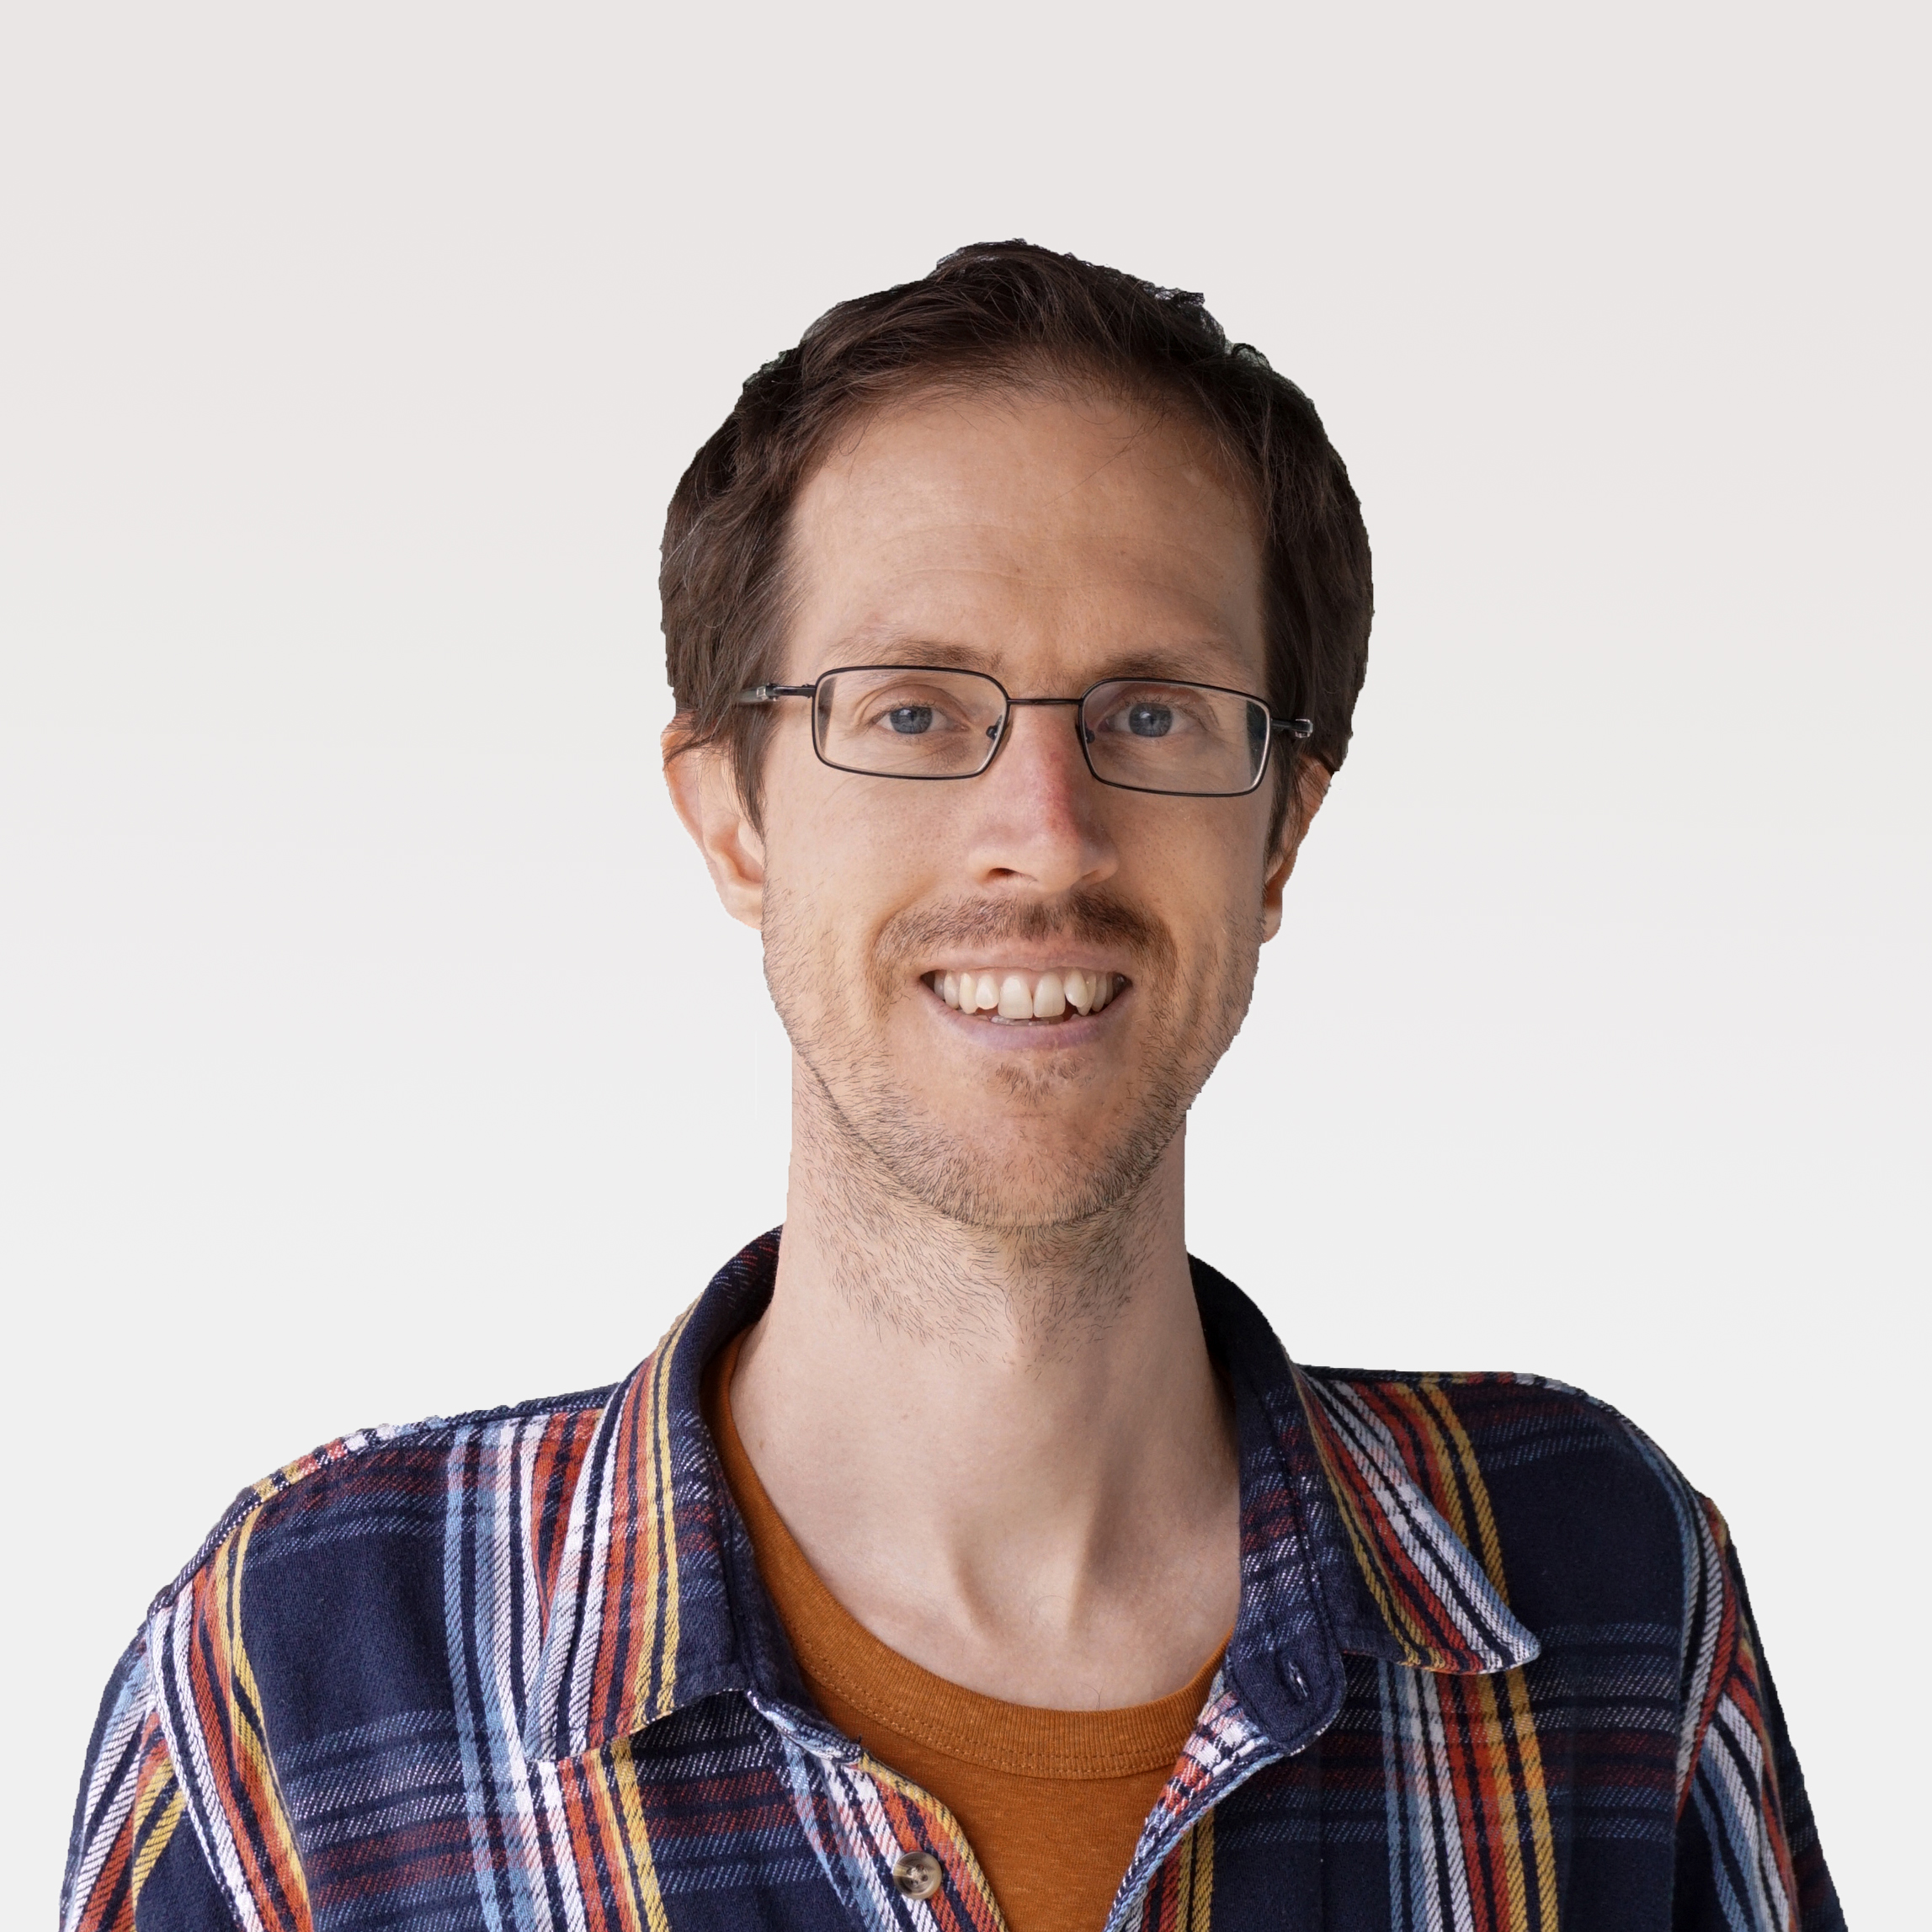 Roland Knubel